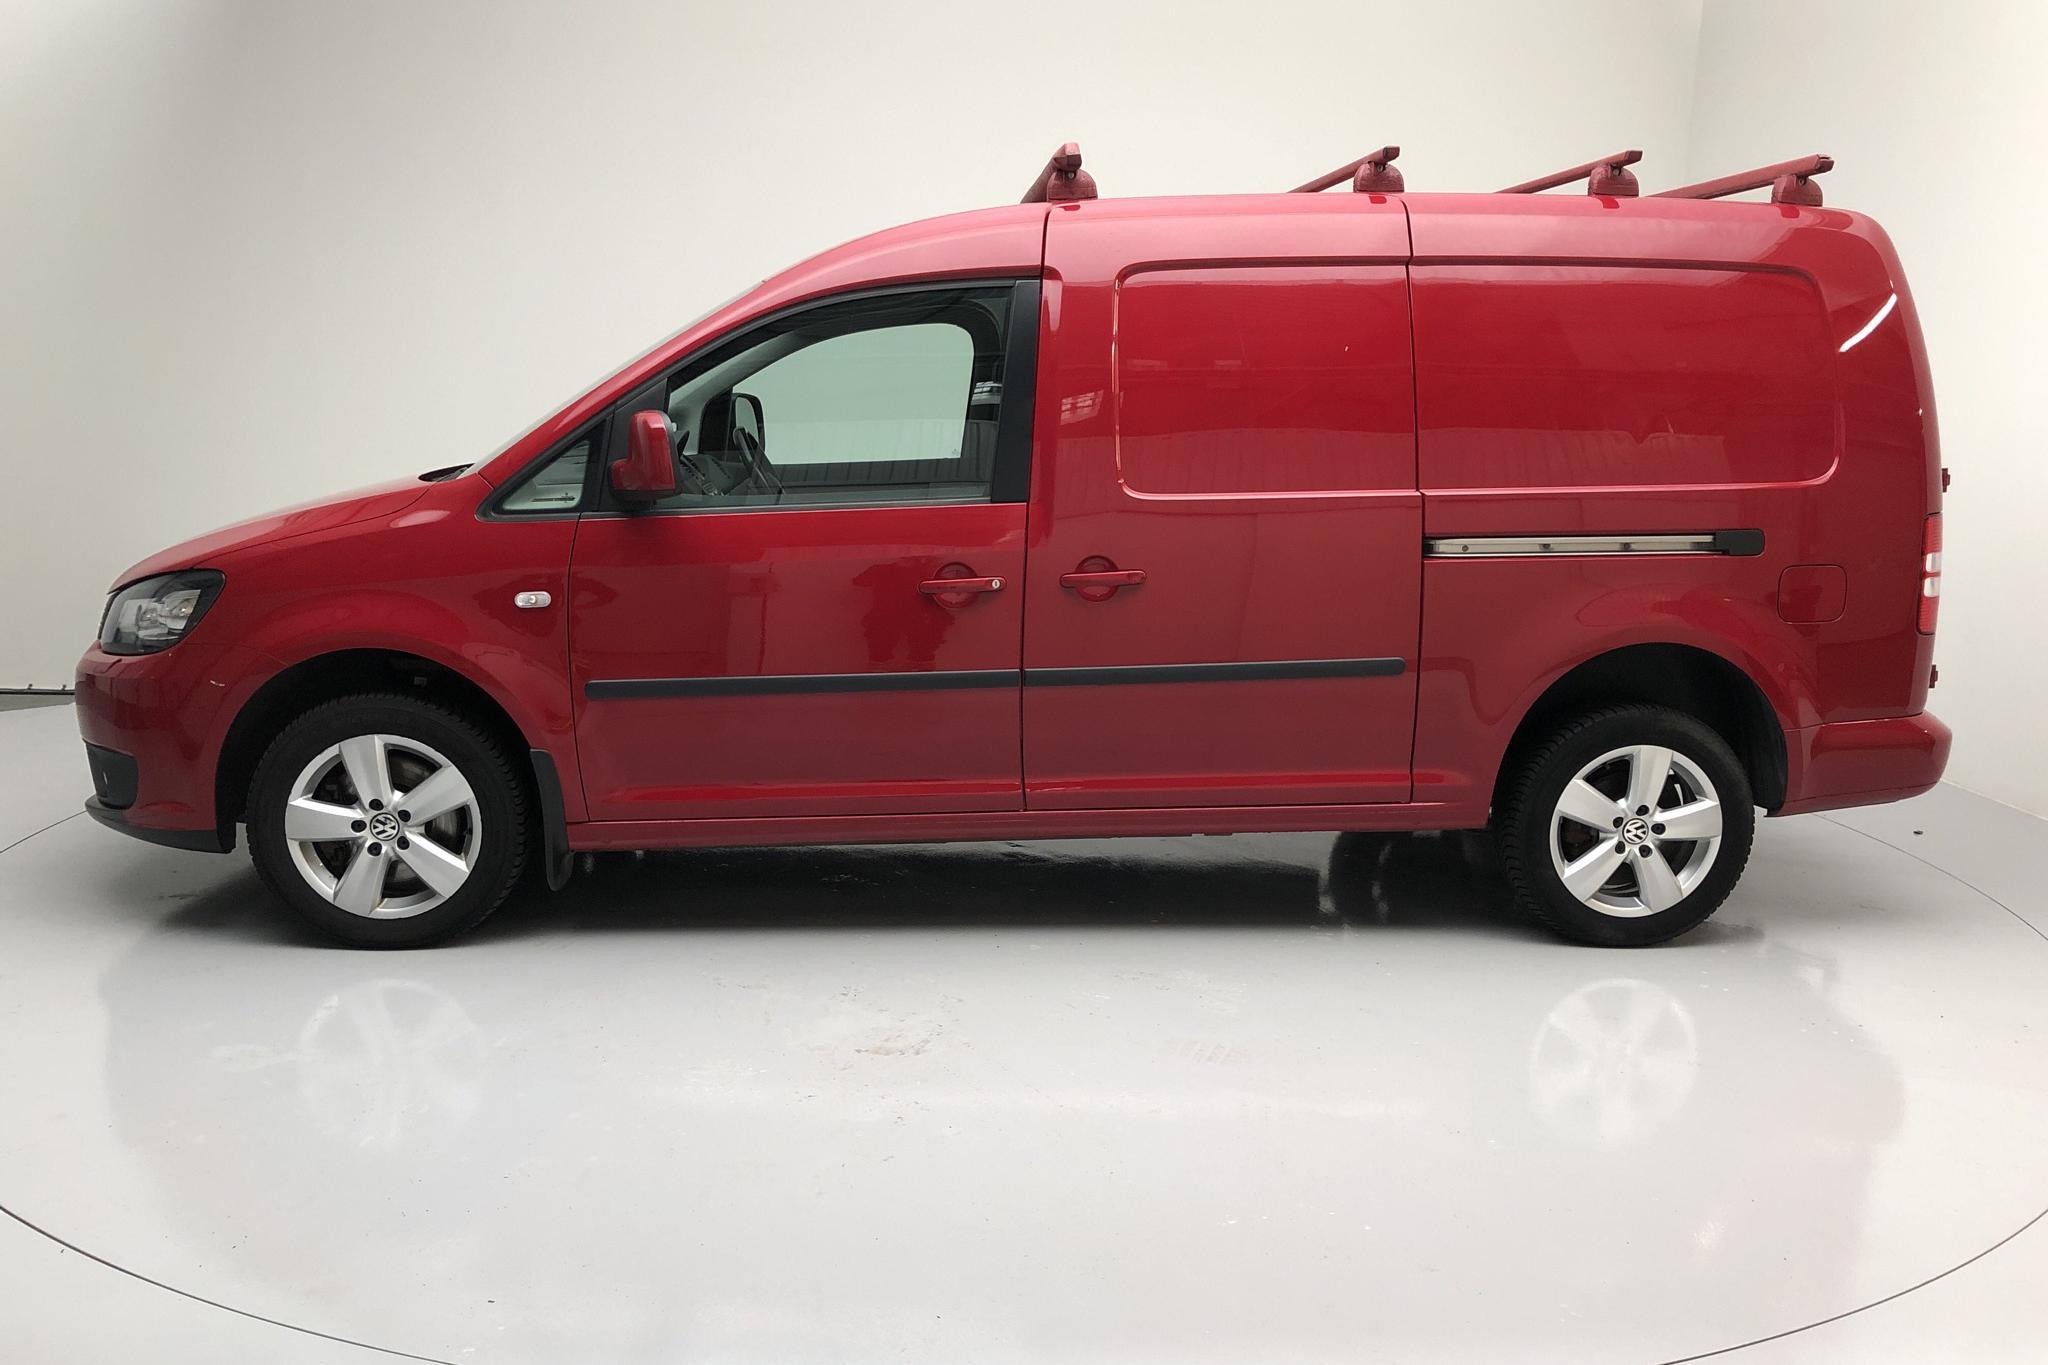 VW Caddy 2.0 TDI Maxi Skåp 4-motion (140hk) - 83 770 km - Automatic - red - 2014